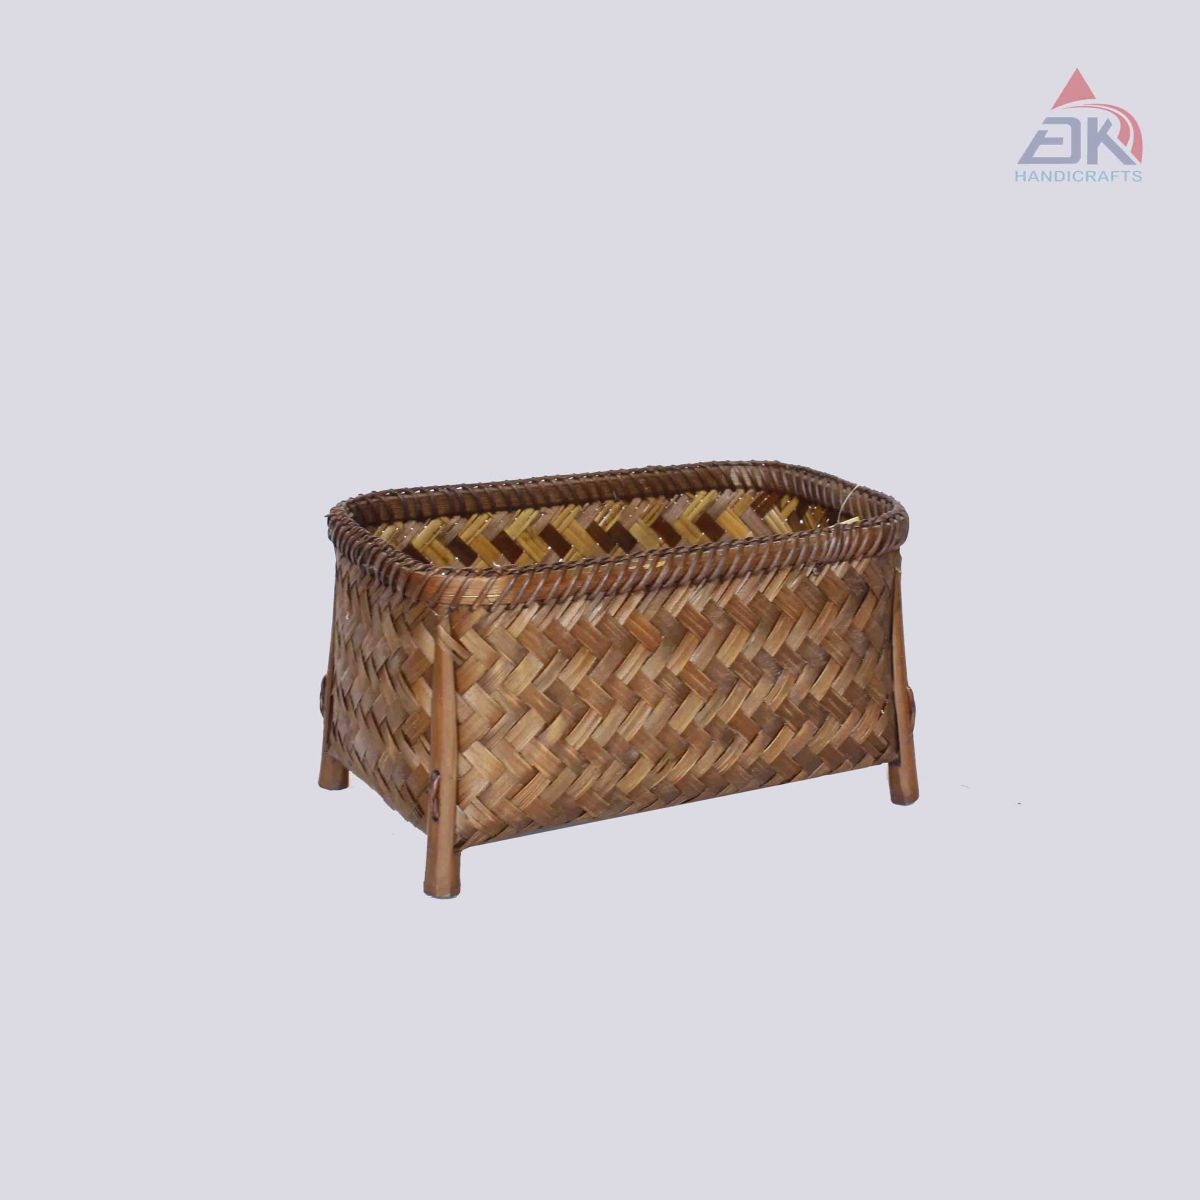 Standing Bamboo Basket